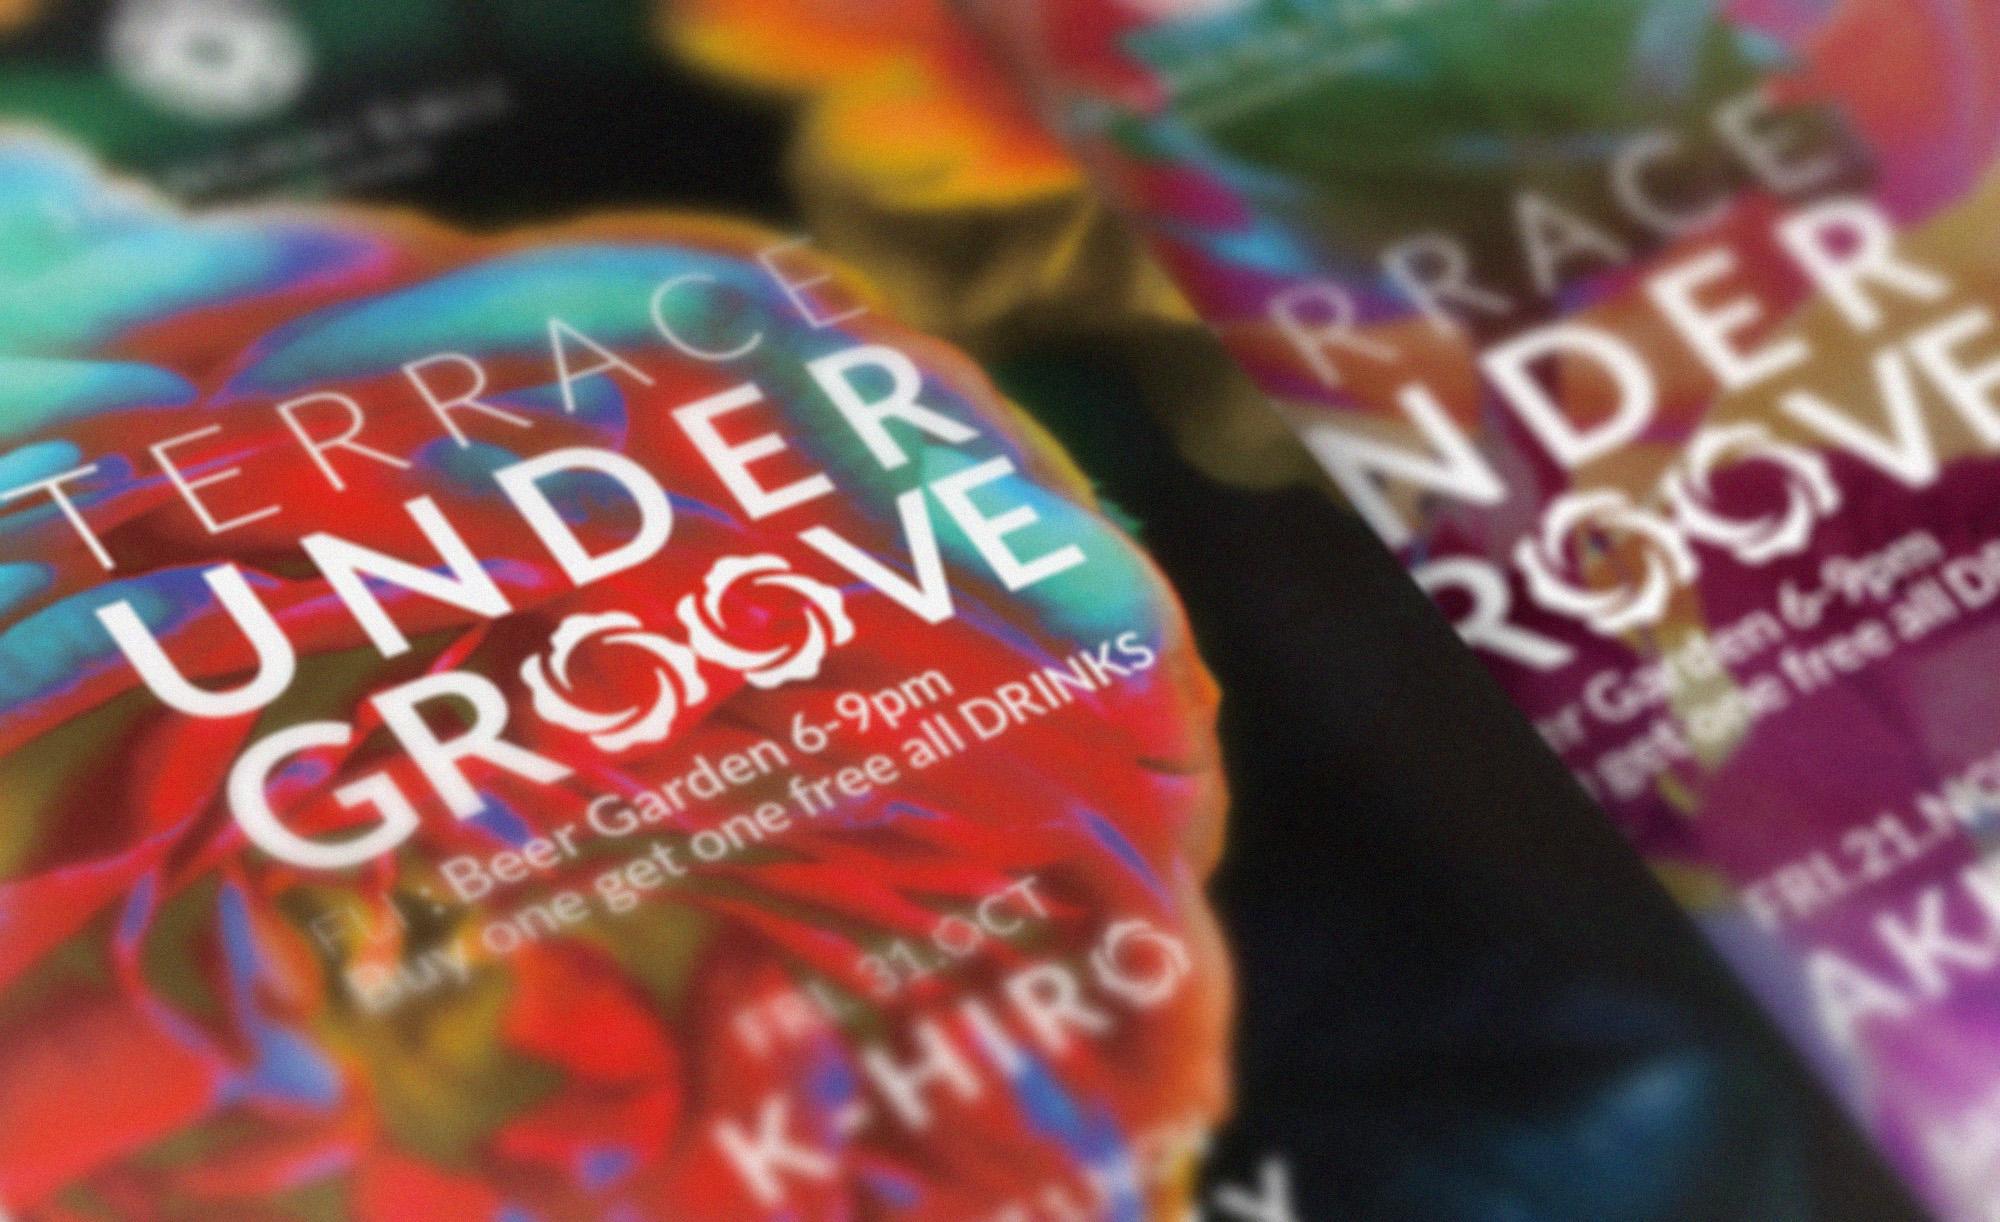 Shanghai Rose : Under Groove Flyers OCT-NOV